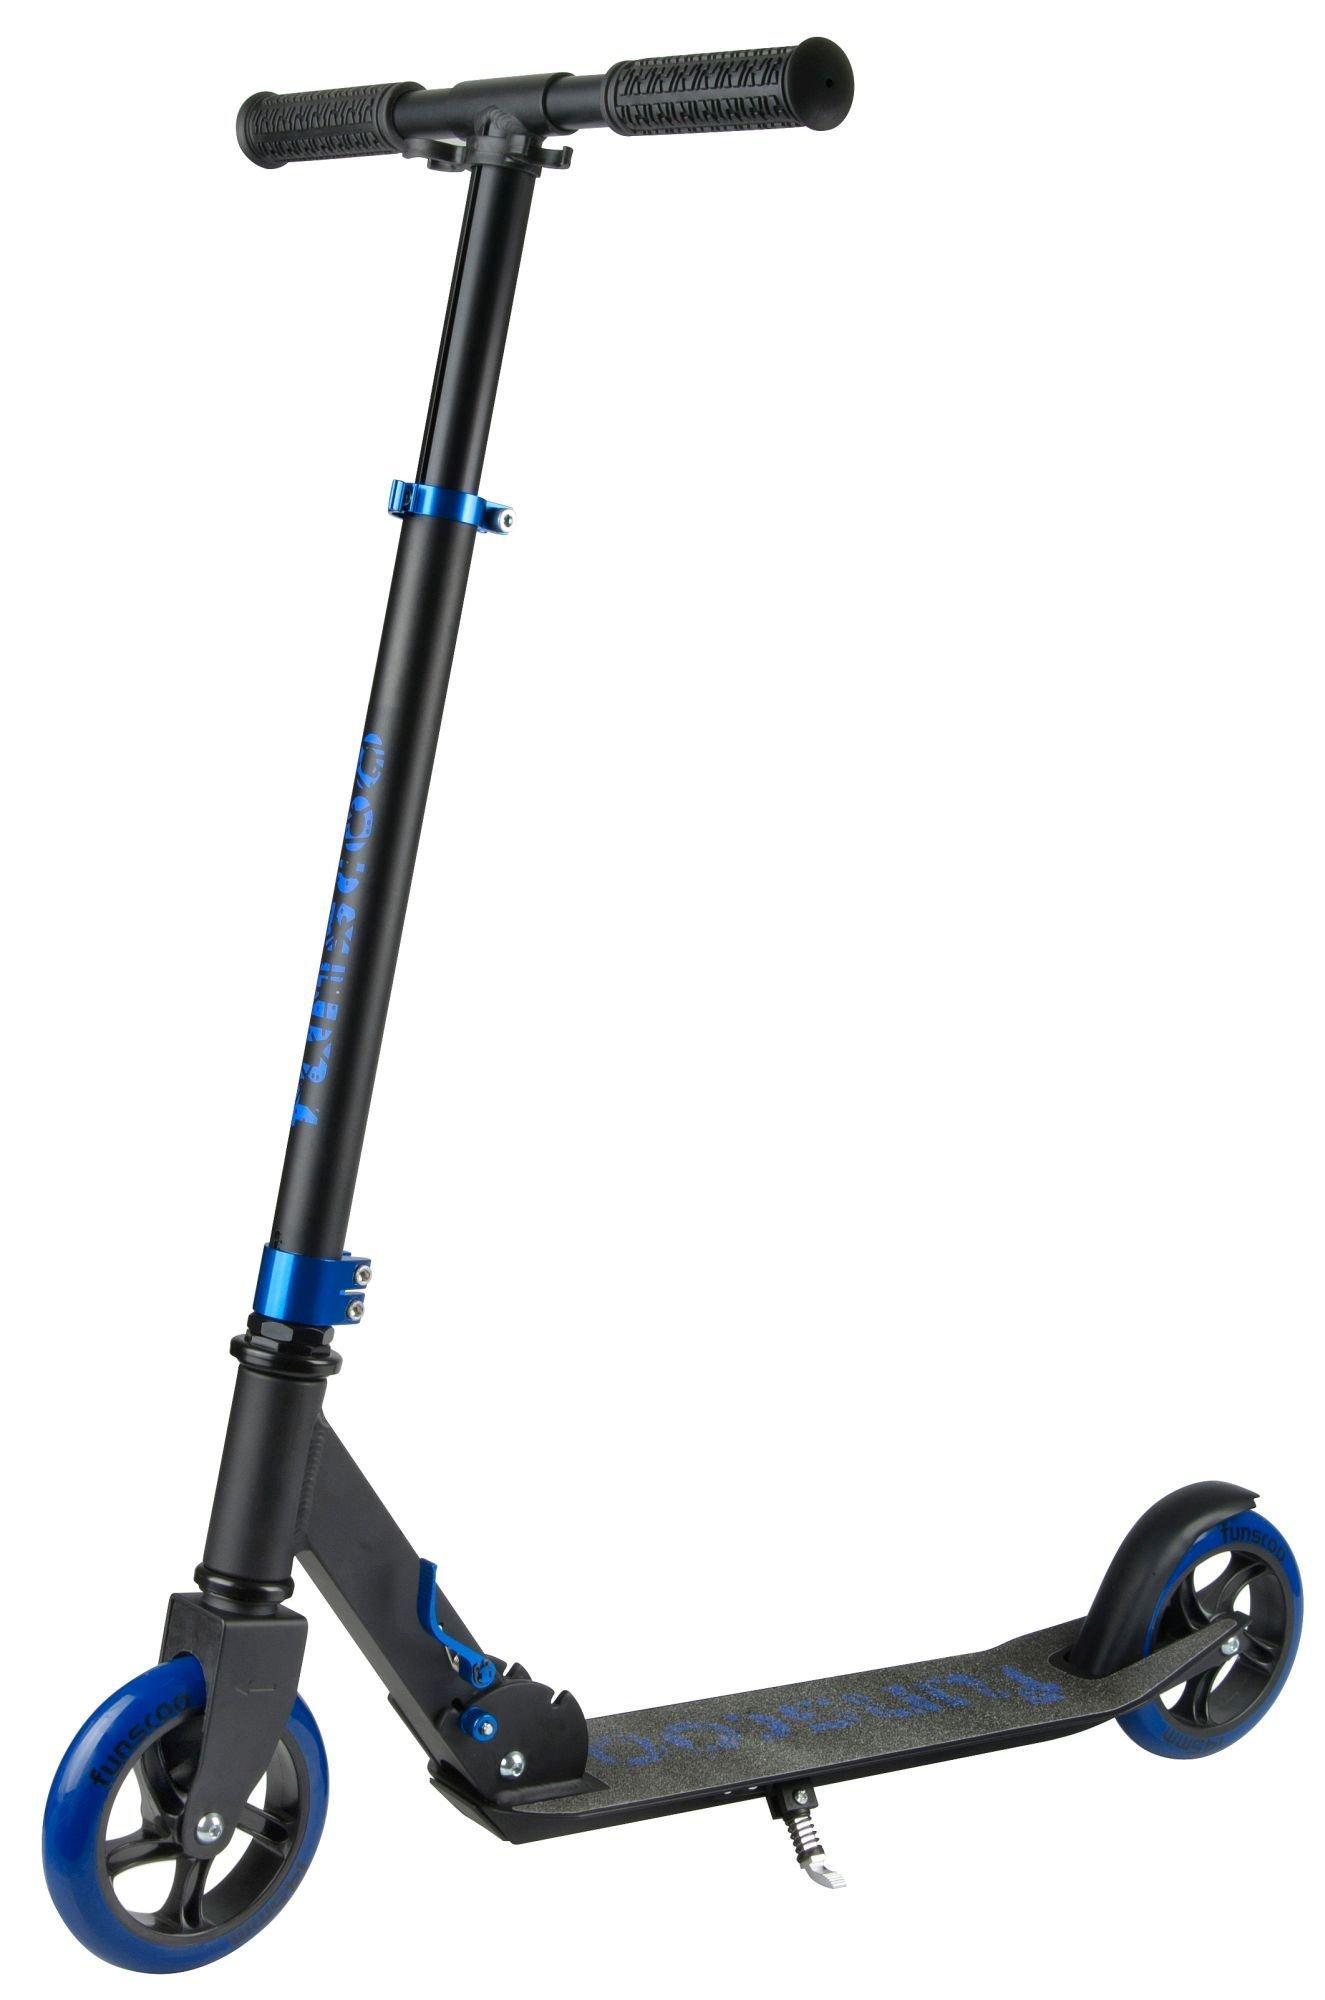 alu-skate-scooter/Kinderartikel: Funscoo funscoo Scooter 145